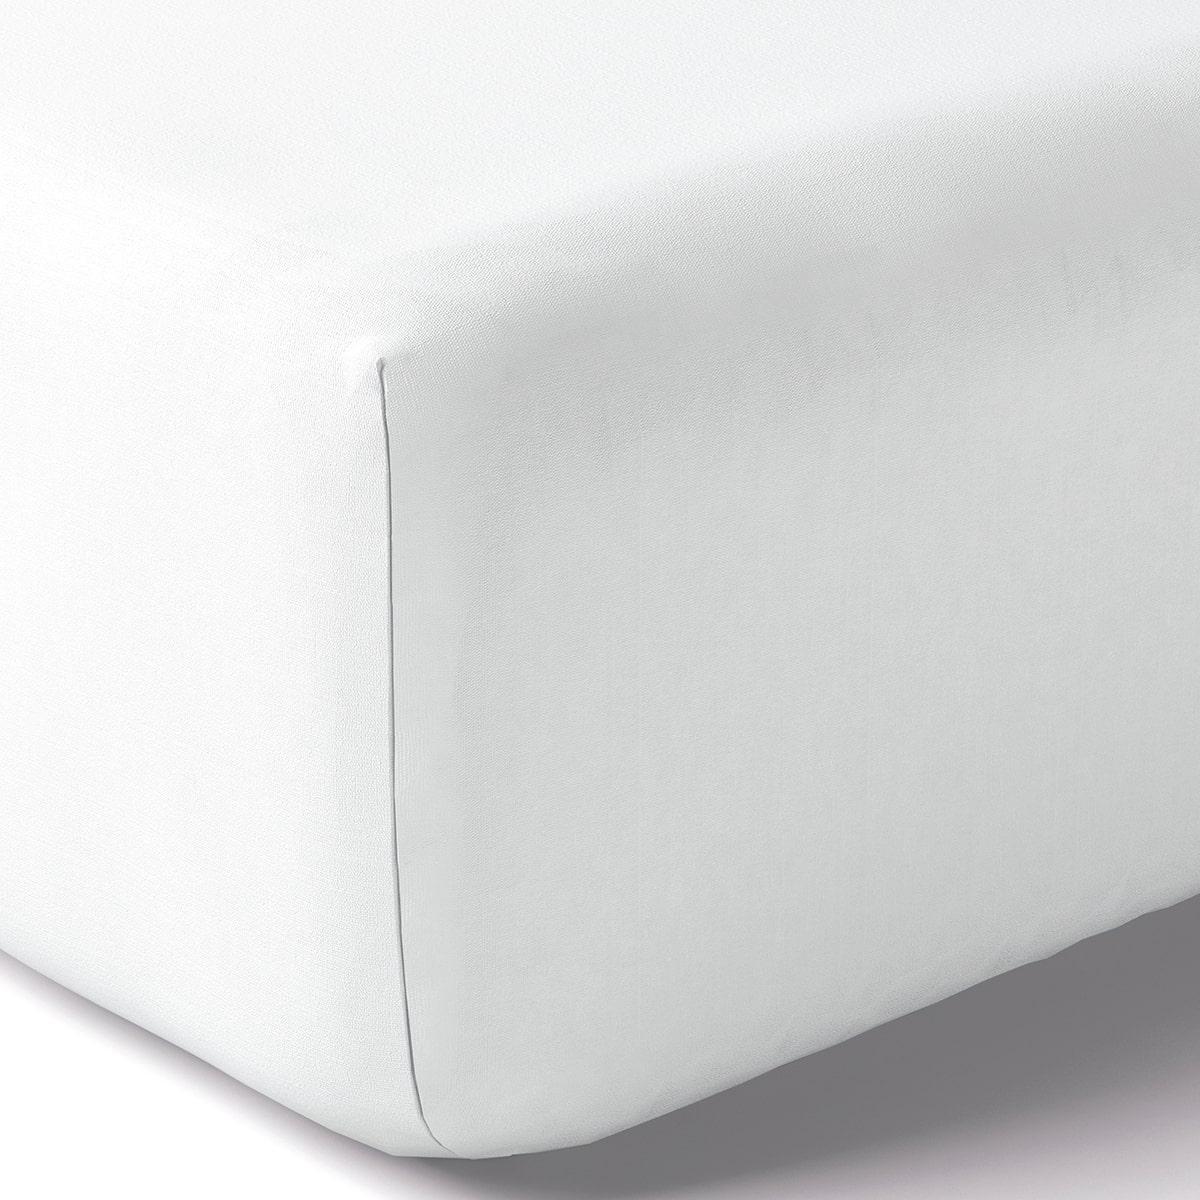 Drap housse coton 160x200 cm blanc